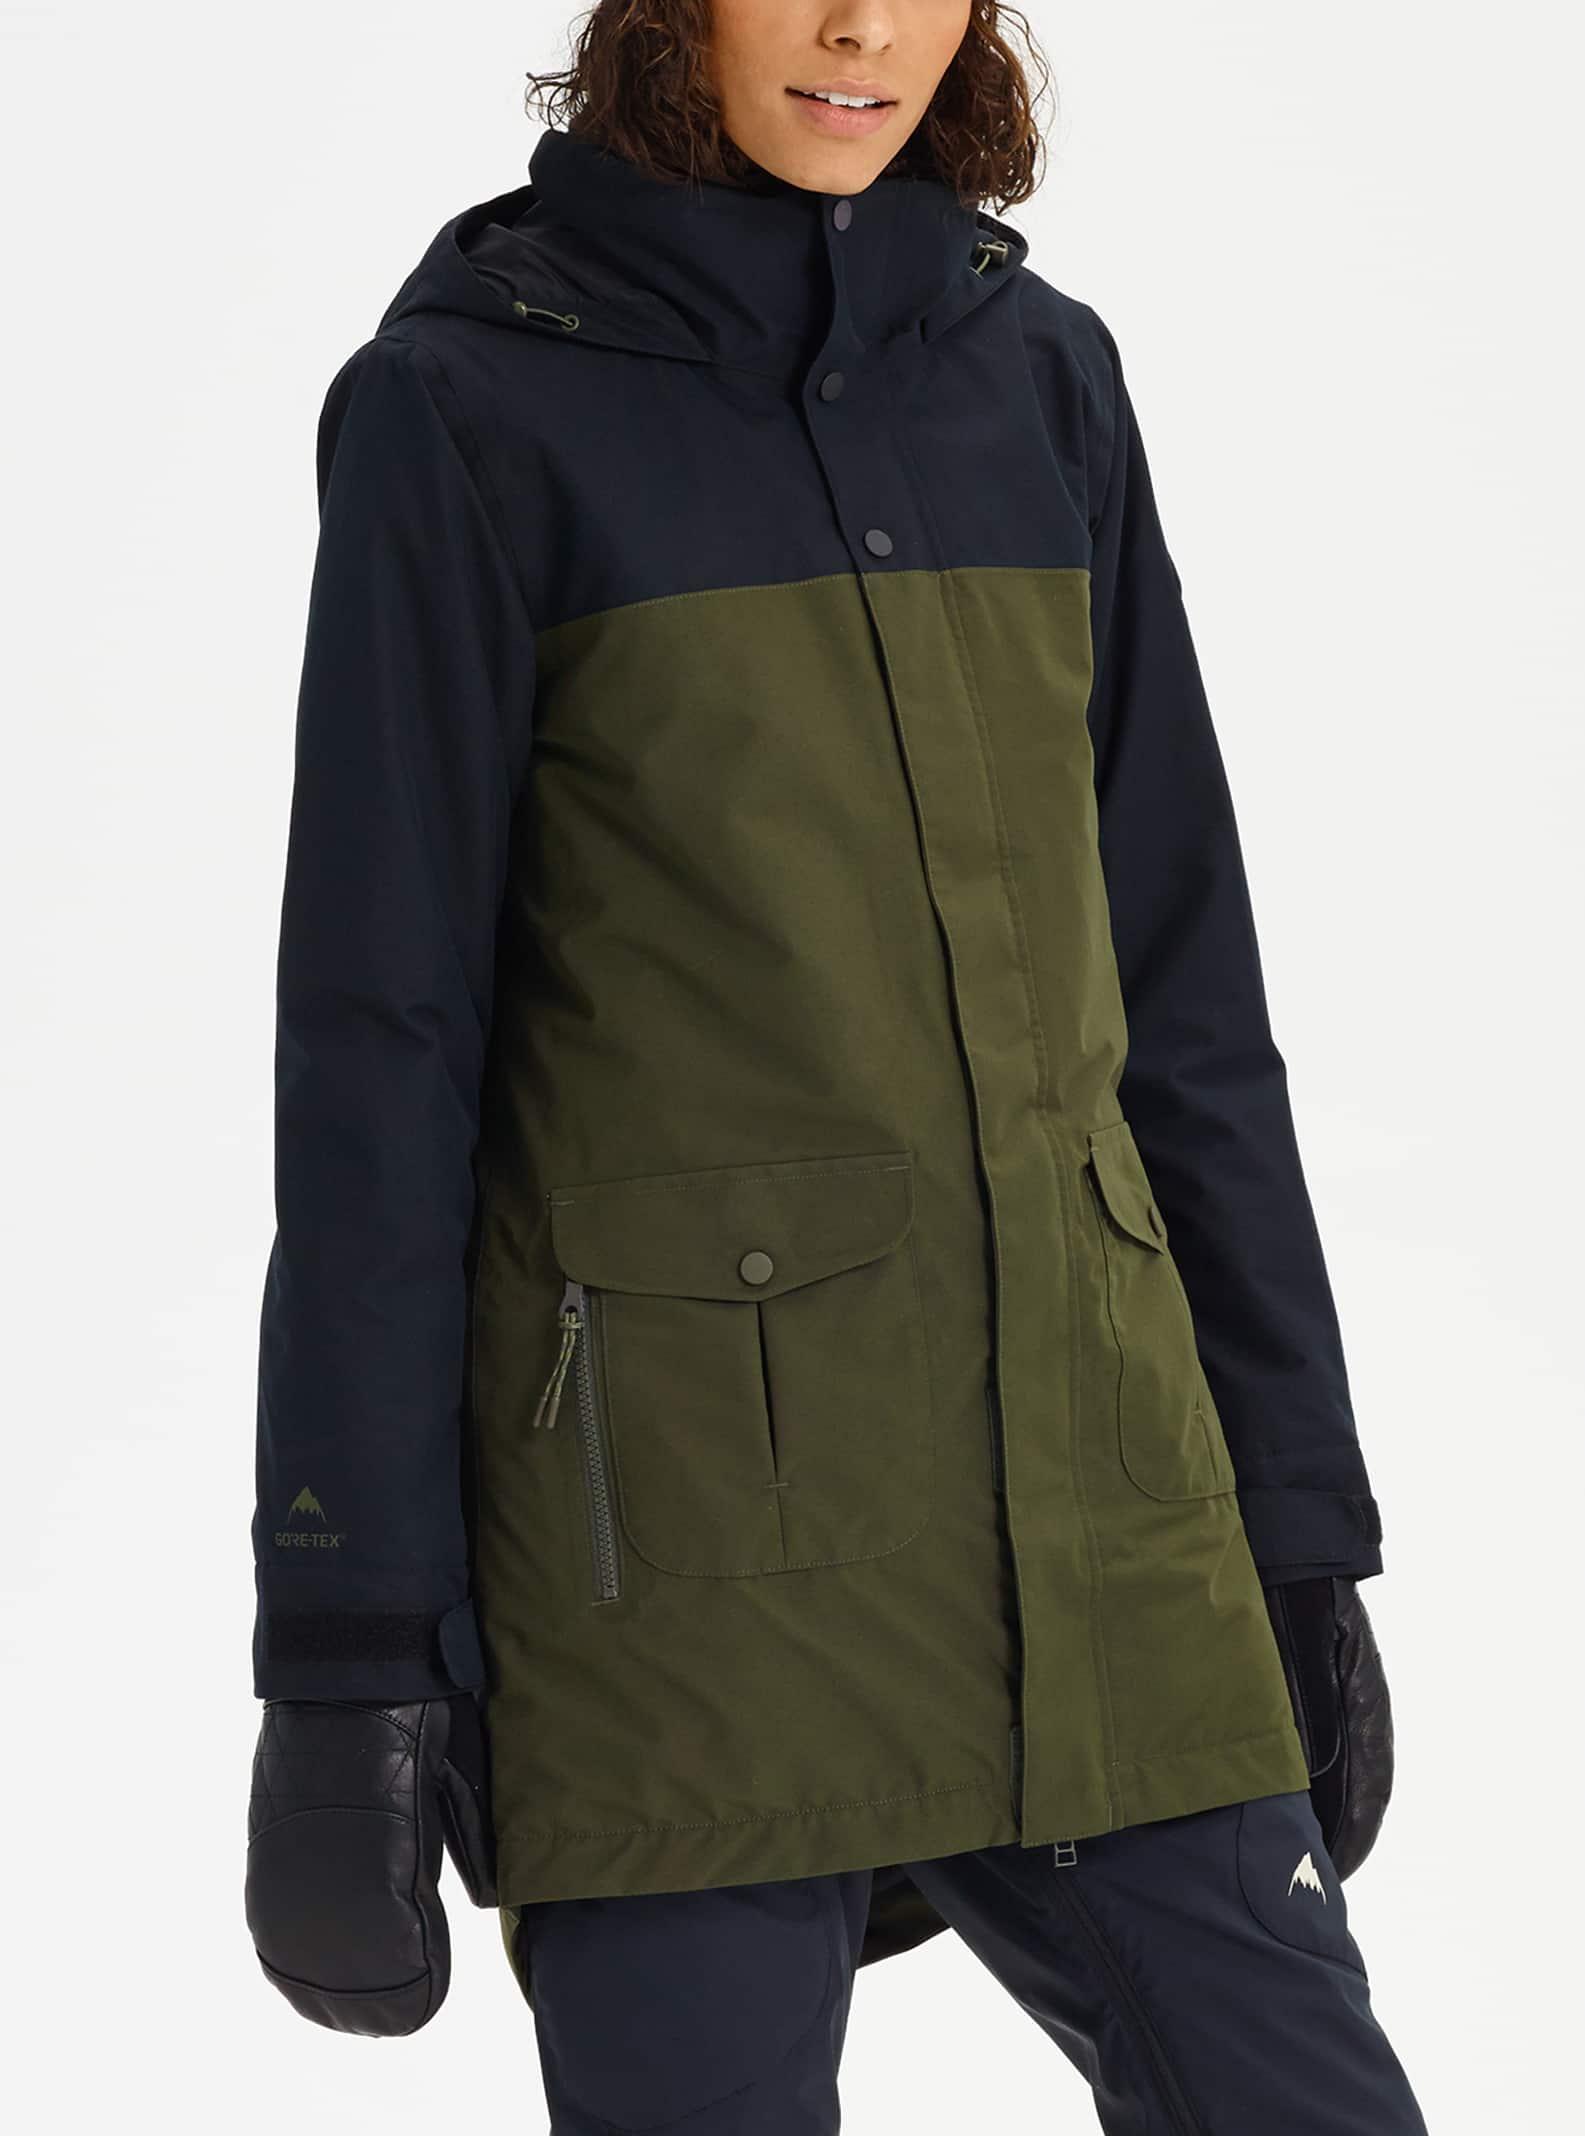 GORE Women's Burton Eyris Jacket TEX RL4A3j5